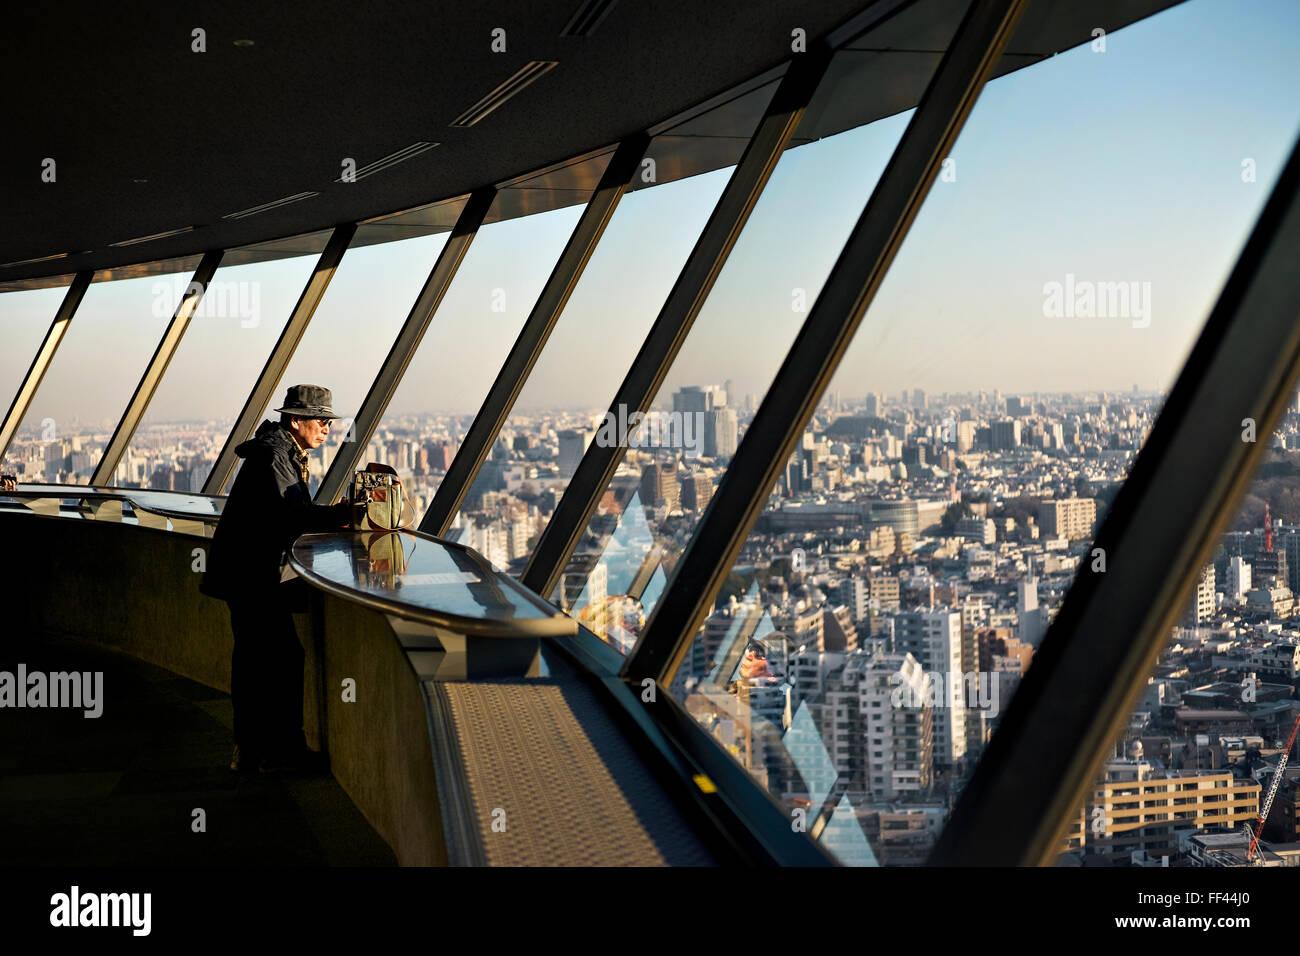 Japan, Honshu island, Kanto, Tokyo, desk view. - Stock Image